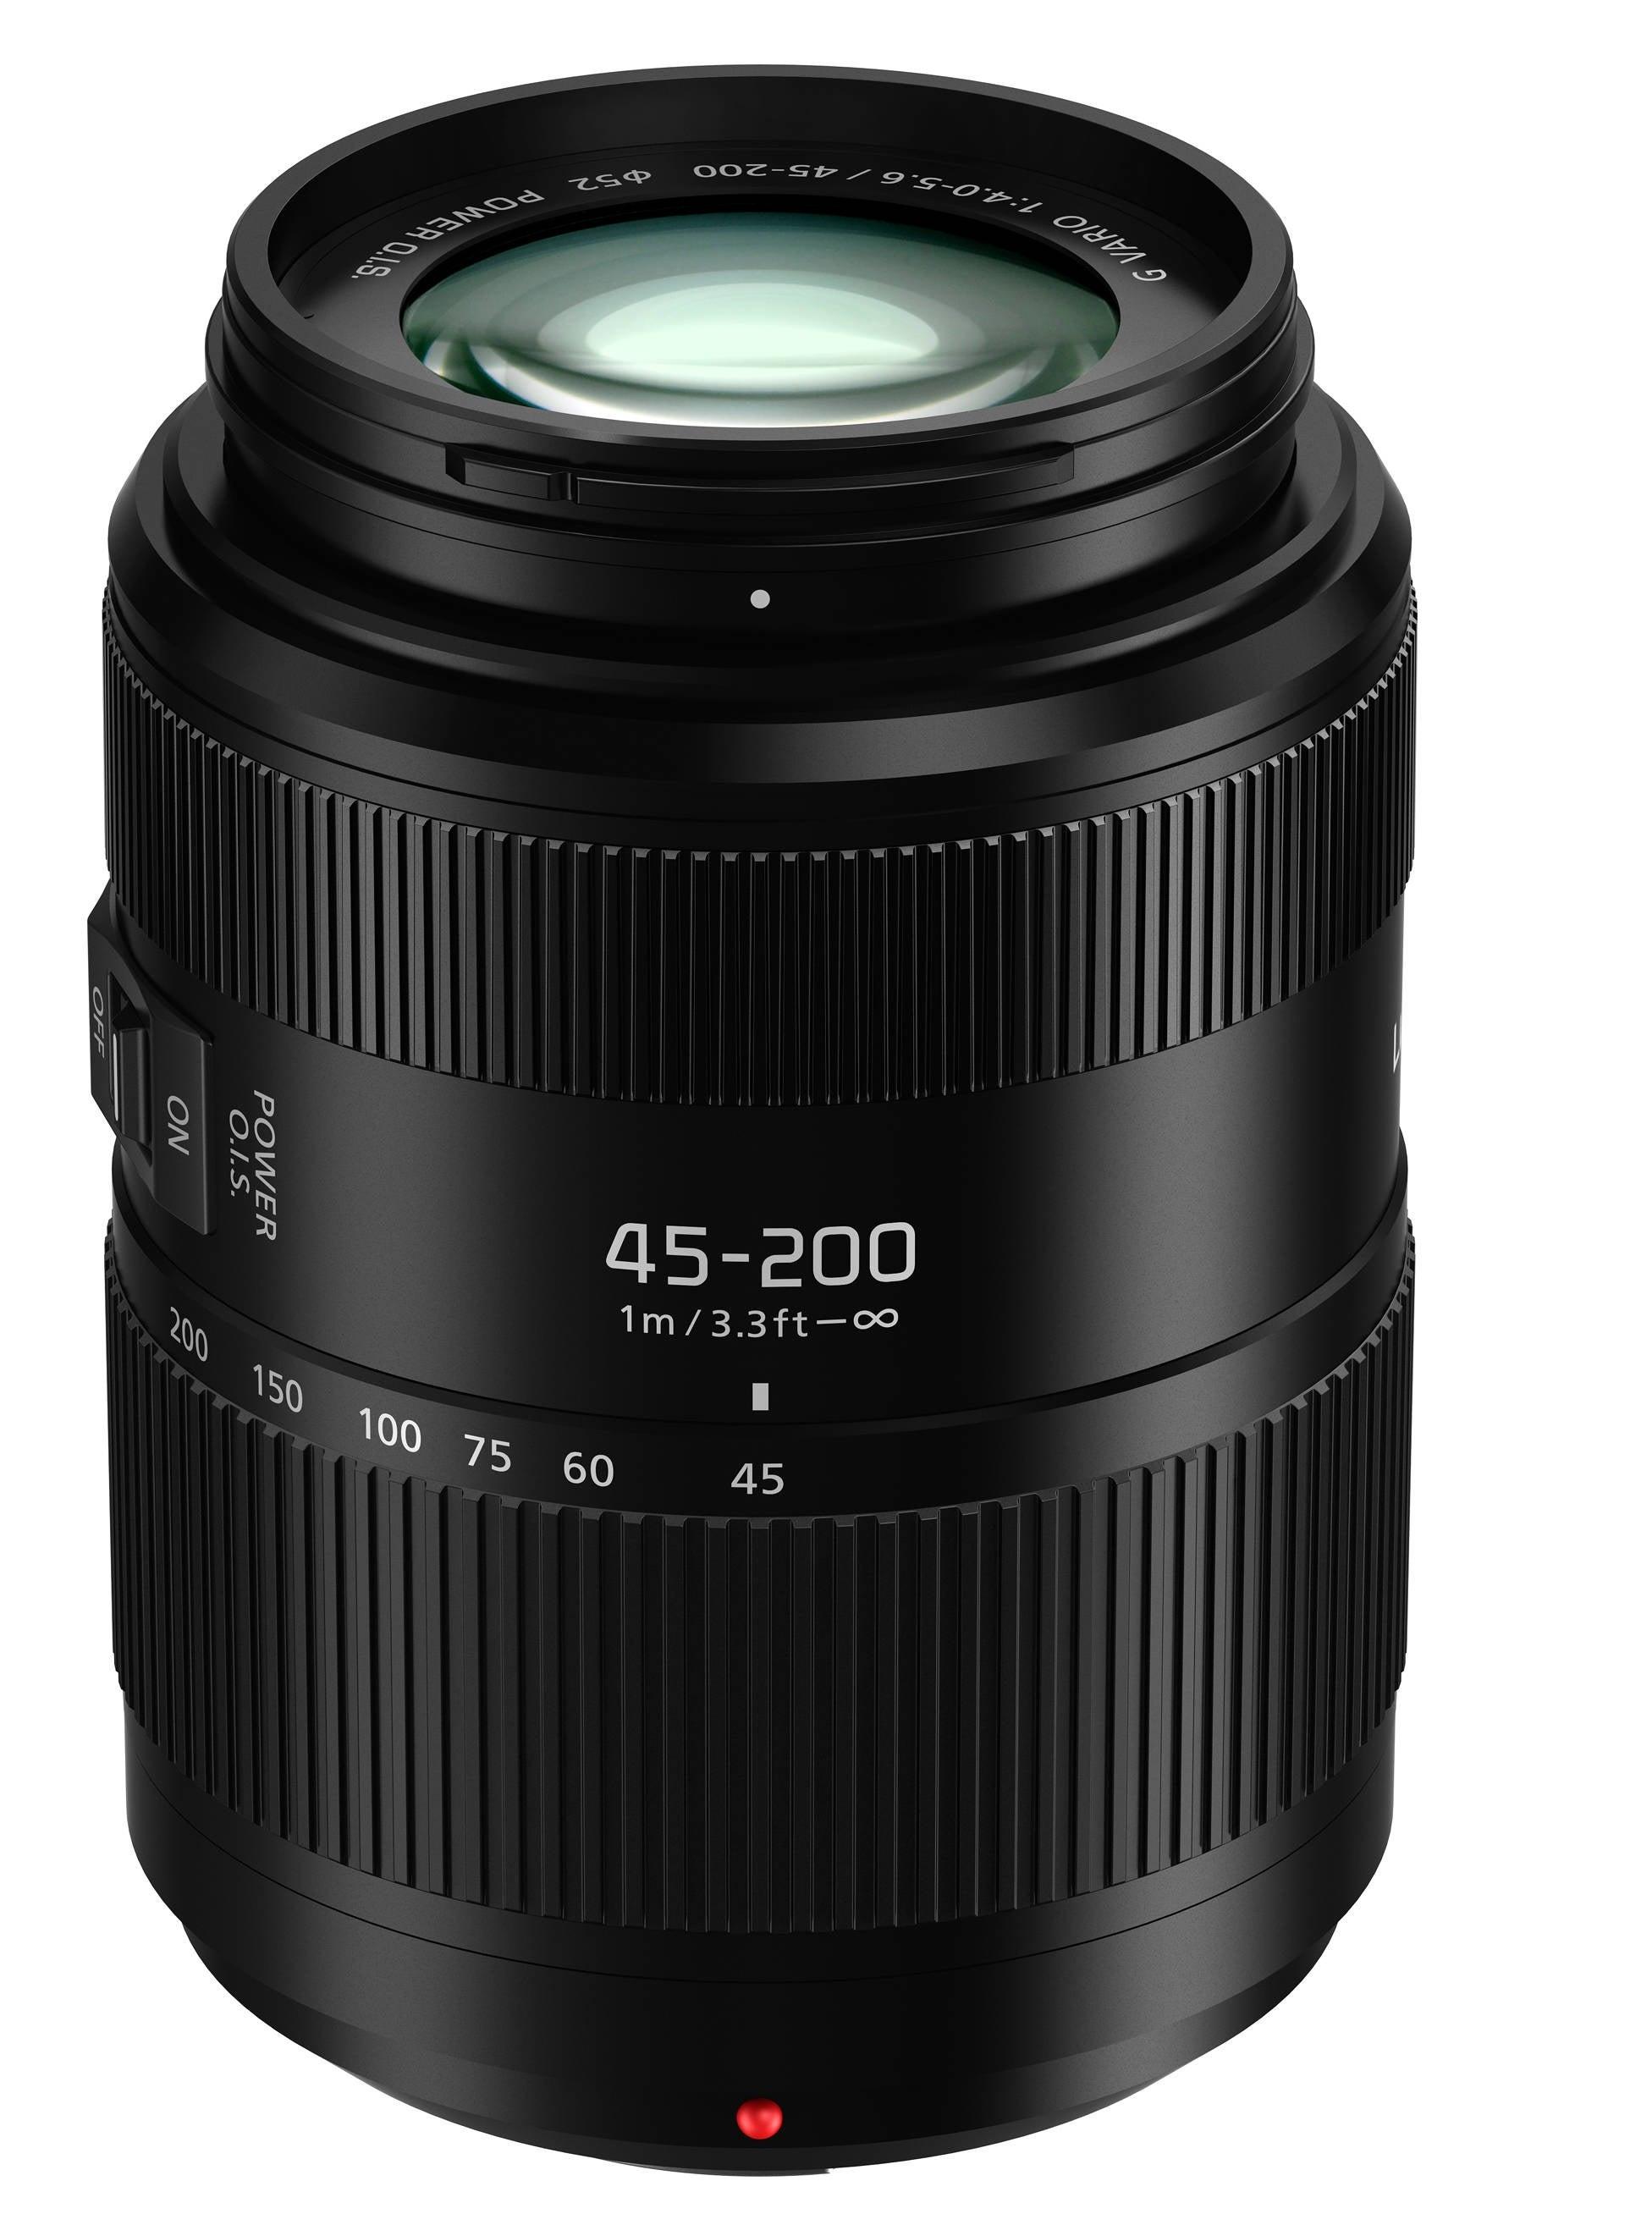 Panasonic 45-200mm F4.0-5.6 II Lumix G Vario Lens